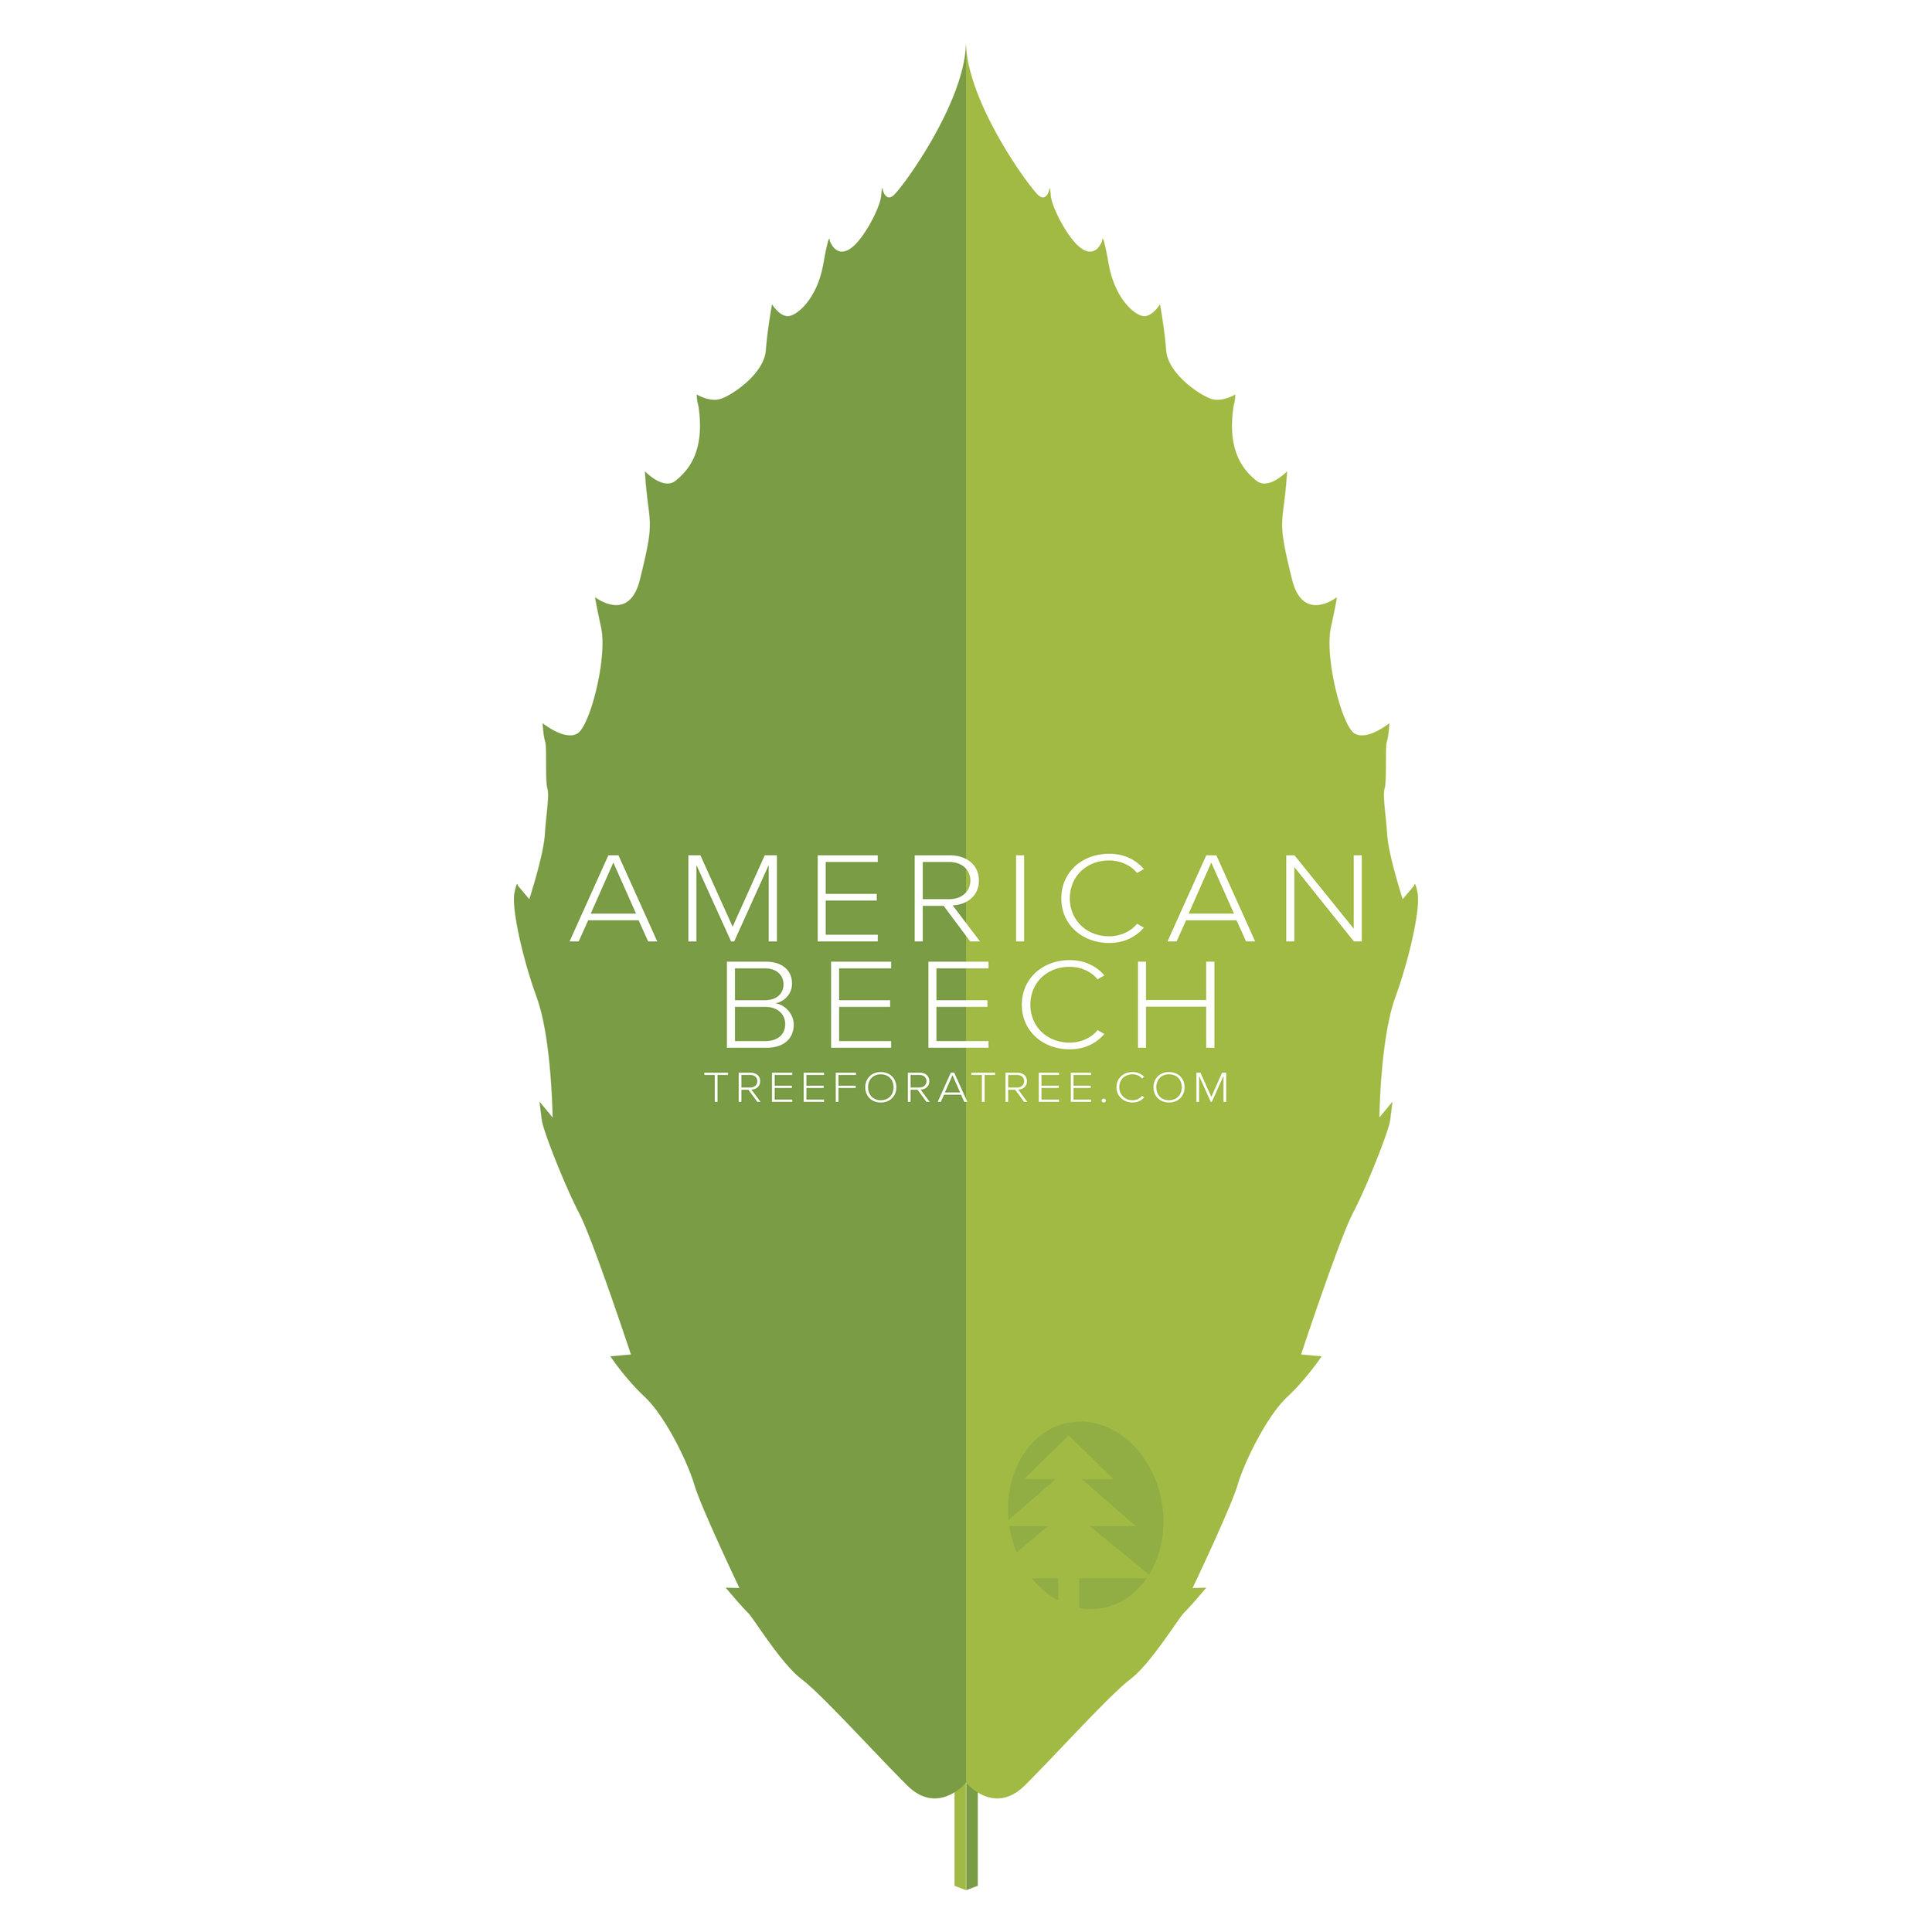 American Beech - Latin Name: Fagus grandifoliaGrowth Rate: SlowMature Height: ≈65 ftMature Spread: ≈85 ftState Champ: Ashtabula Co. (96' high x 32' spread)